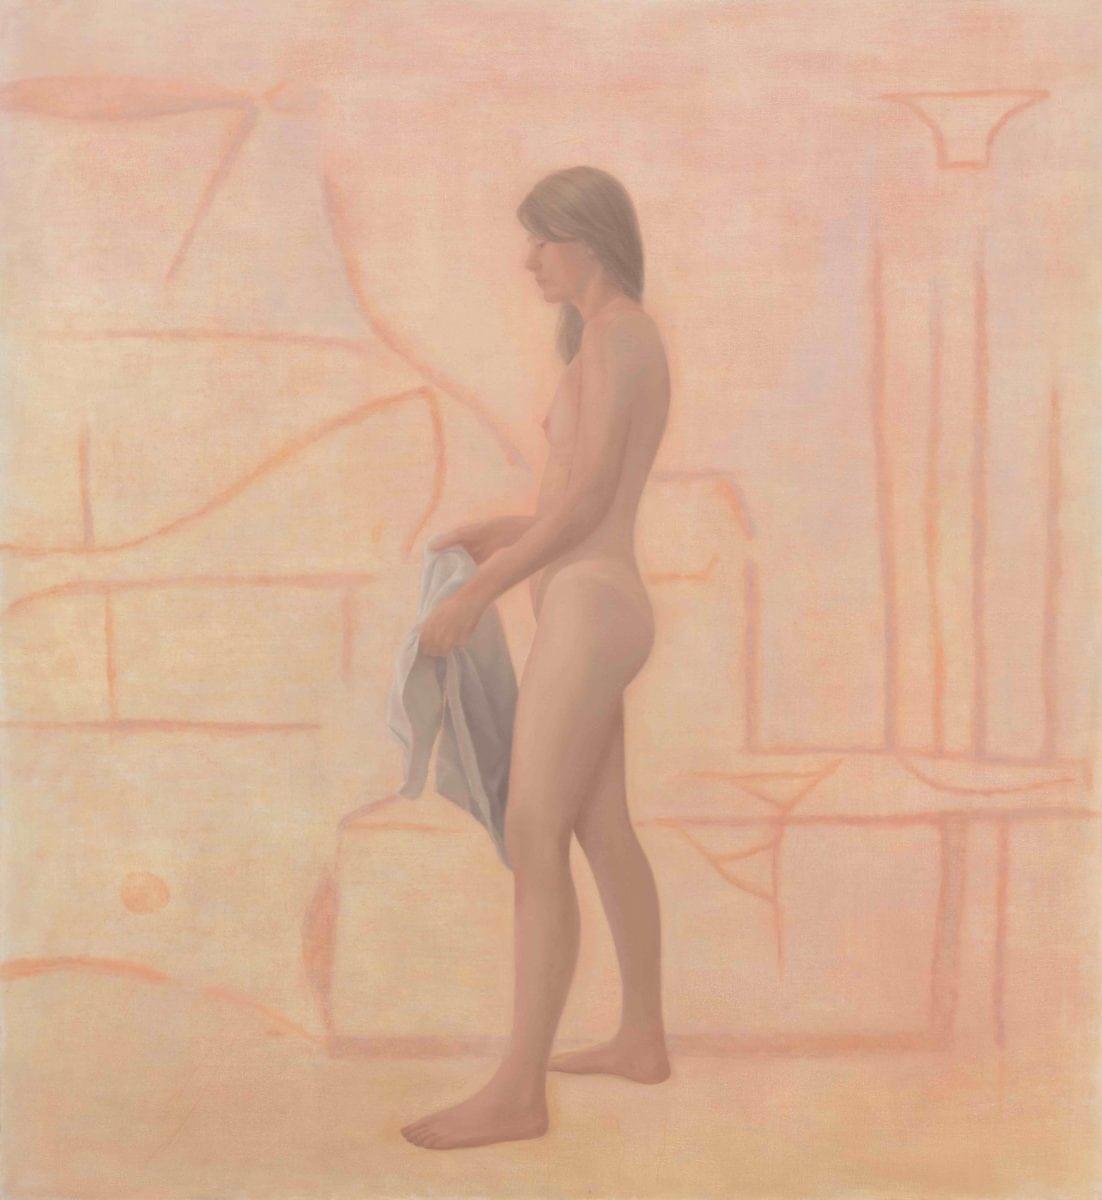 Sarah in the Sauna, Melanie Ebenhoch, 2018, Photo: dotgain.info, Courtesy Galerie Tobias Naehring, Leipzig